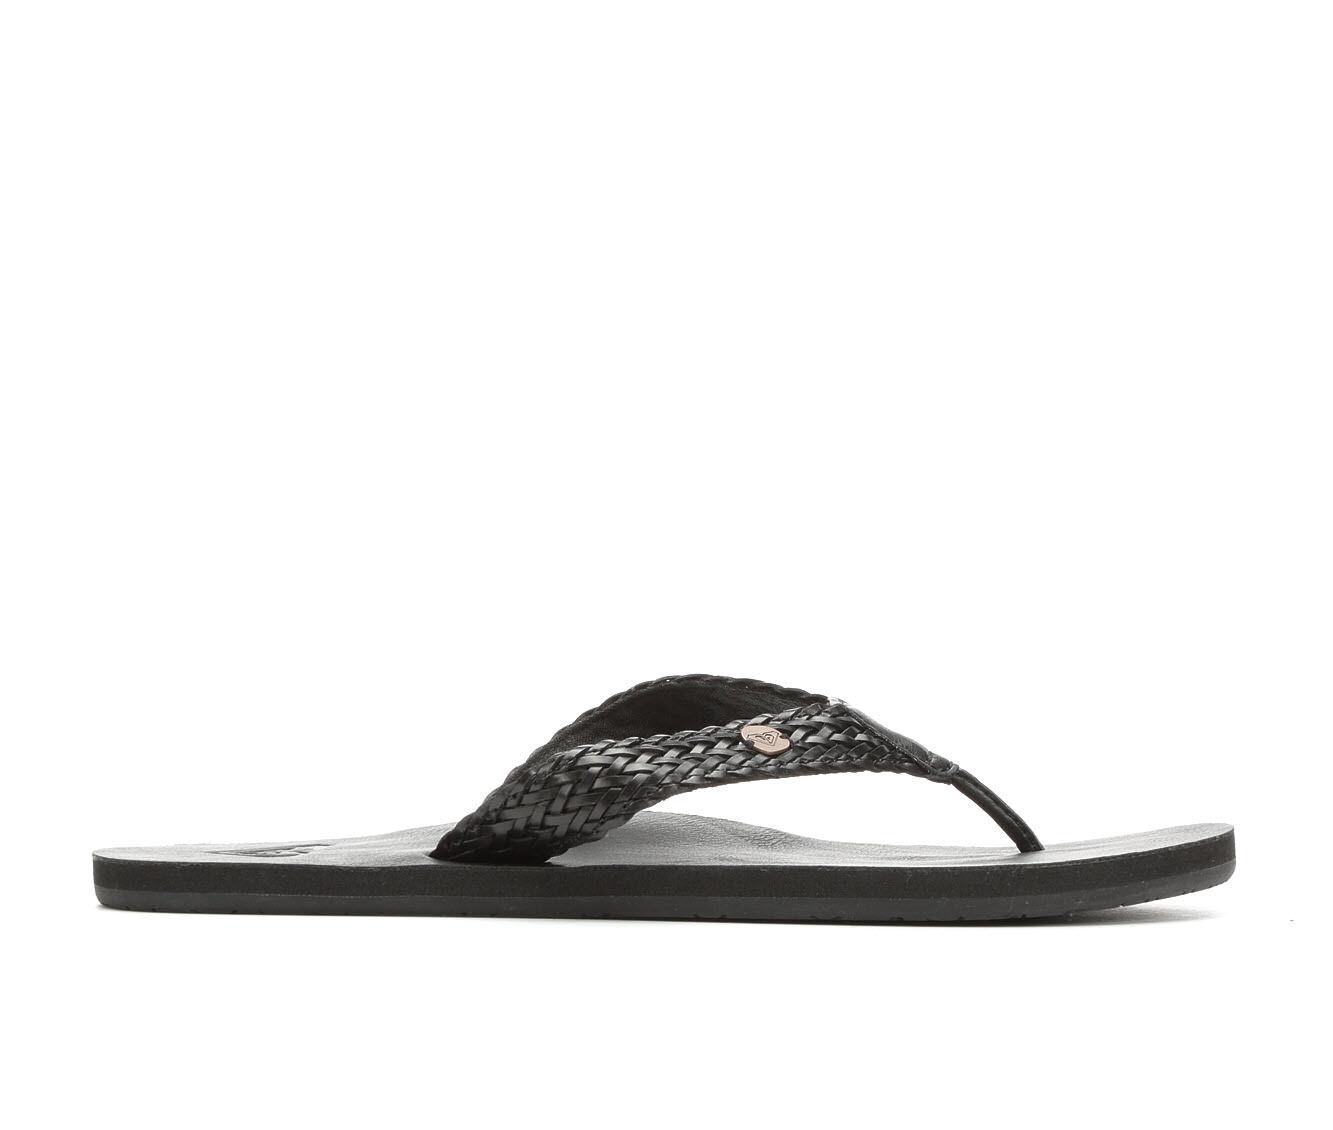 uk shoes_kd7122